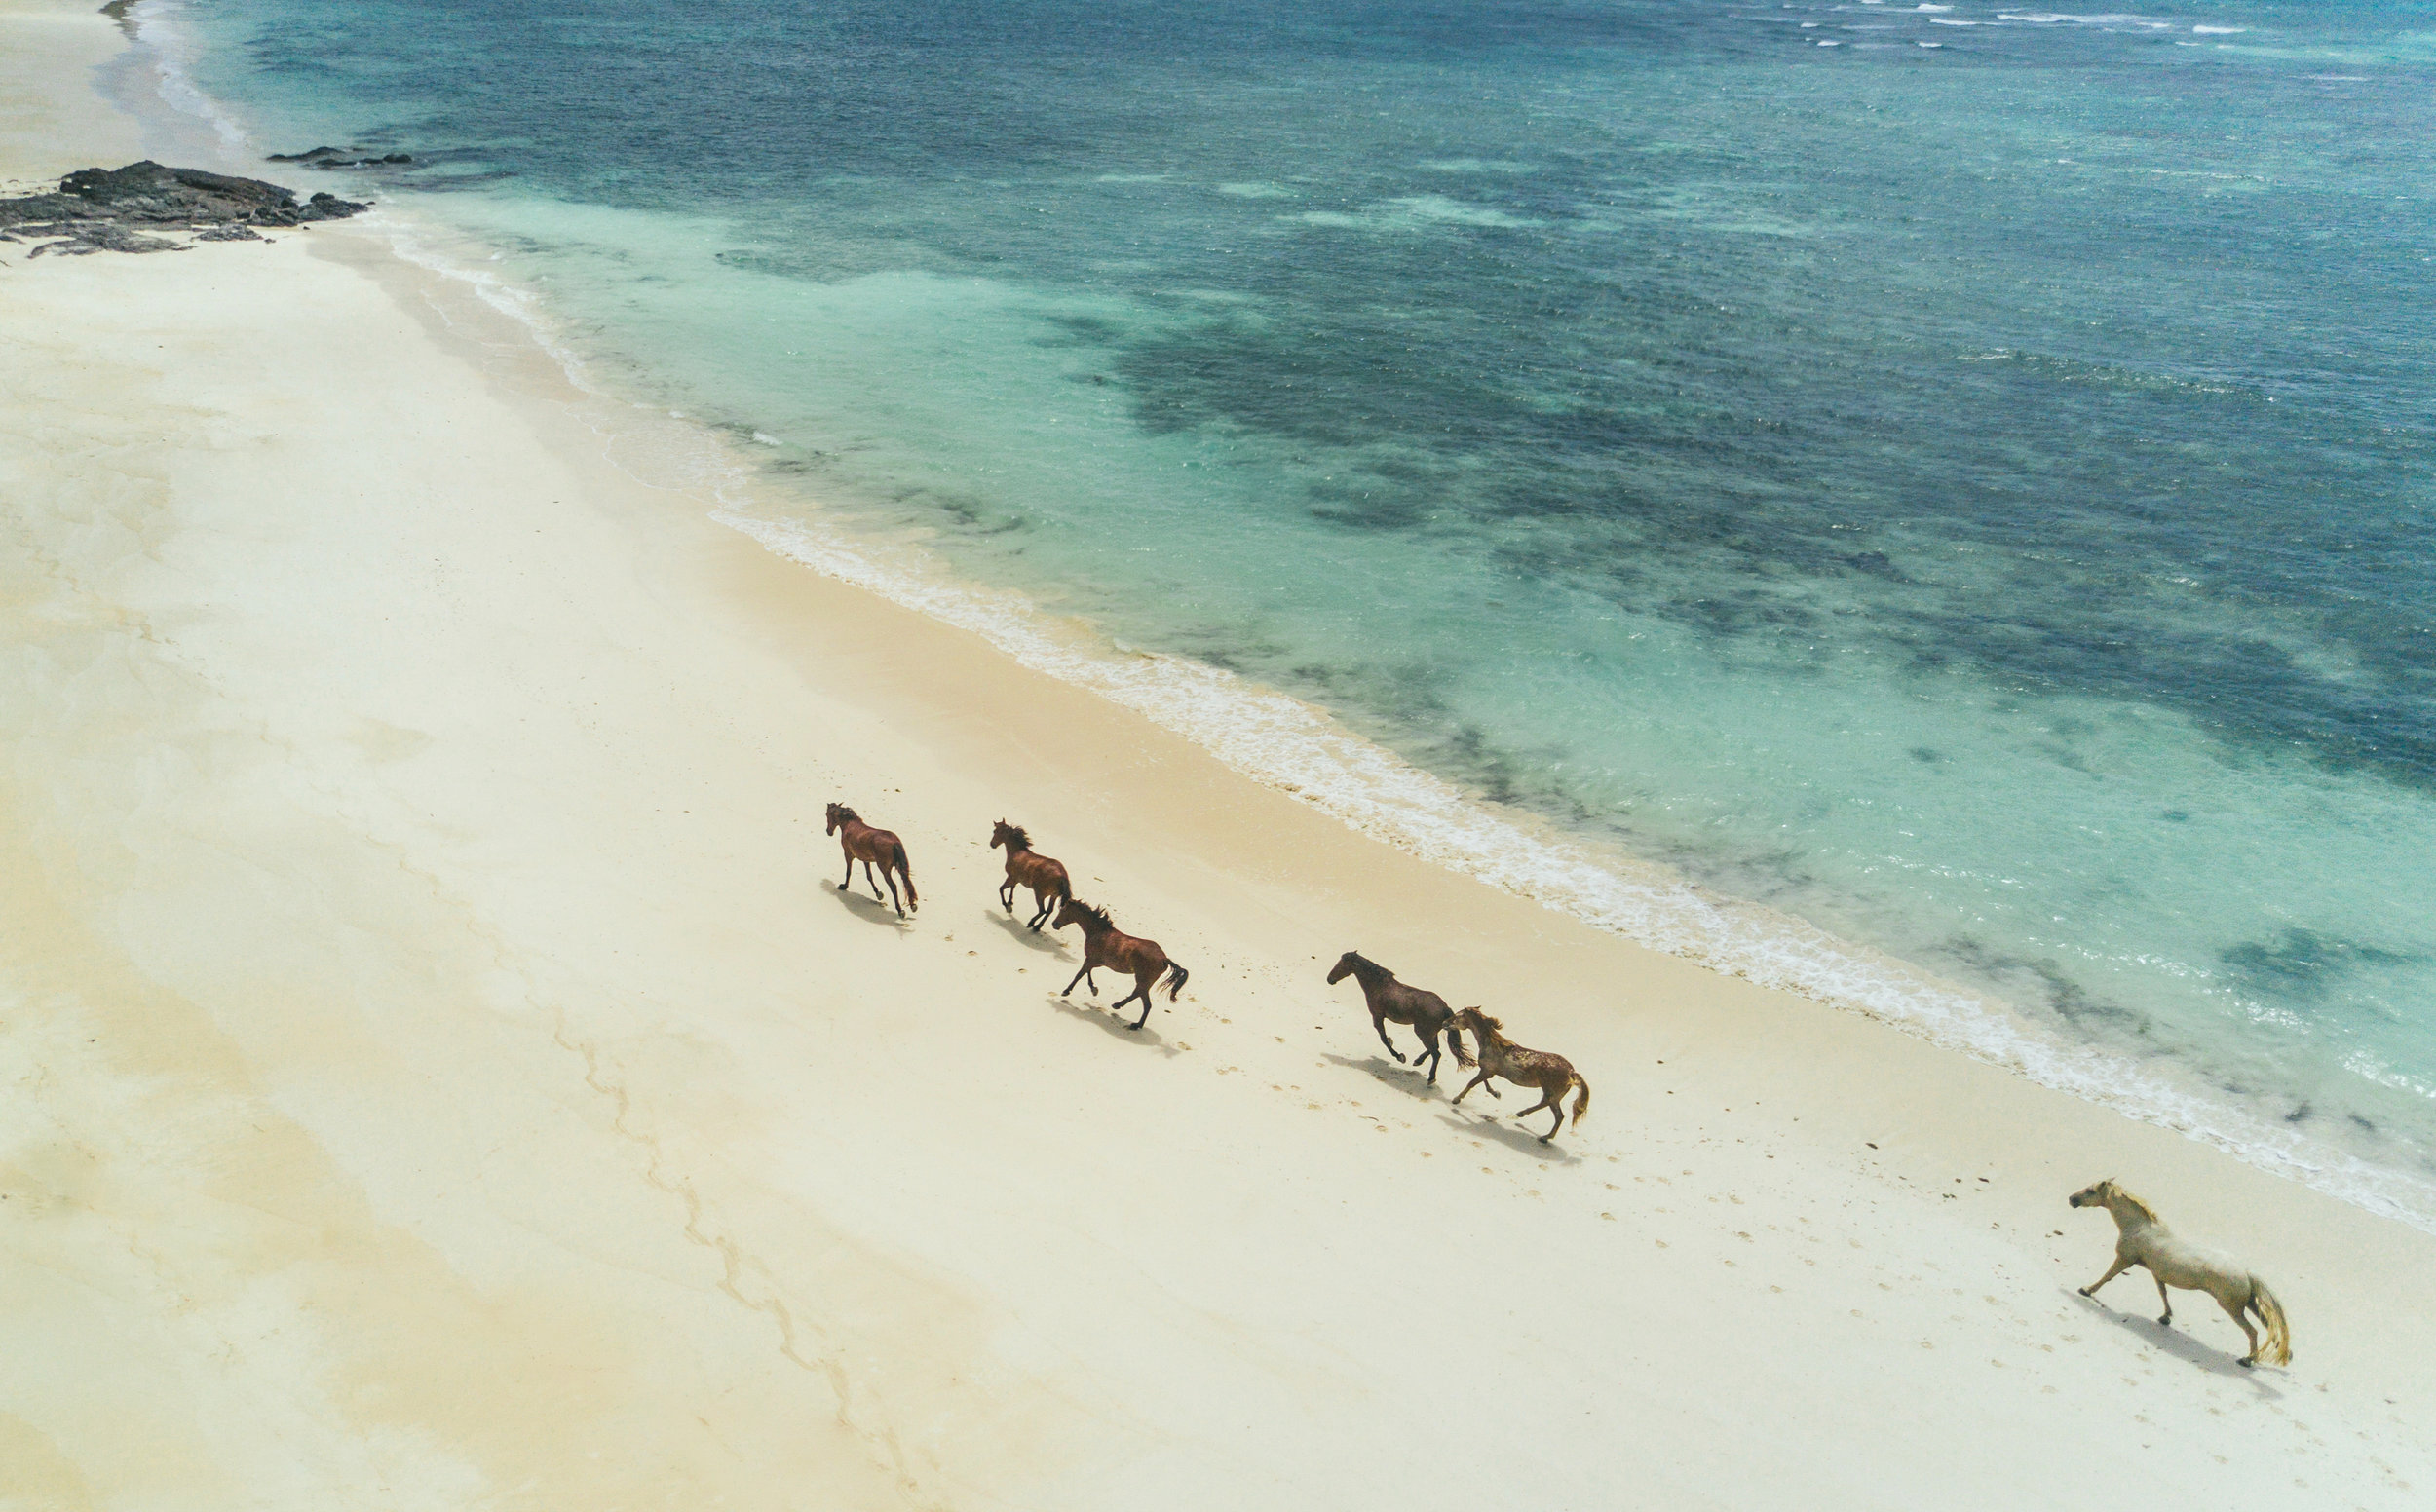 TurtleIsland-horses running on beach-kamacatchme photography.jpg